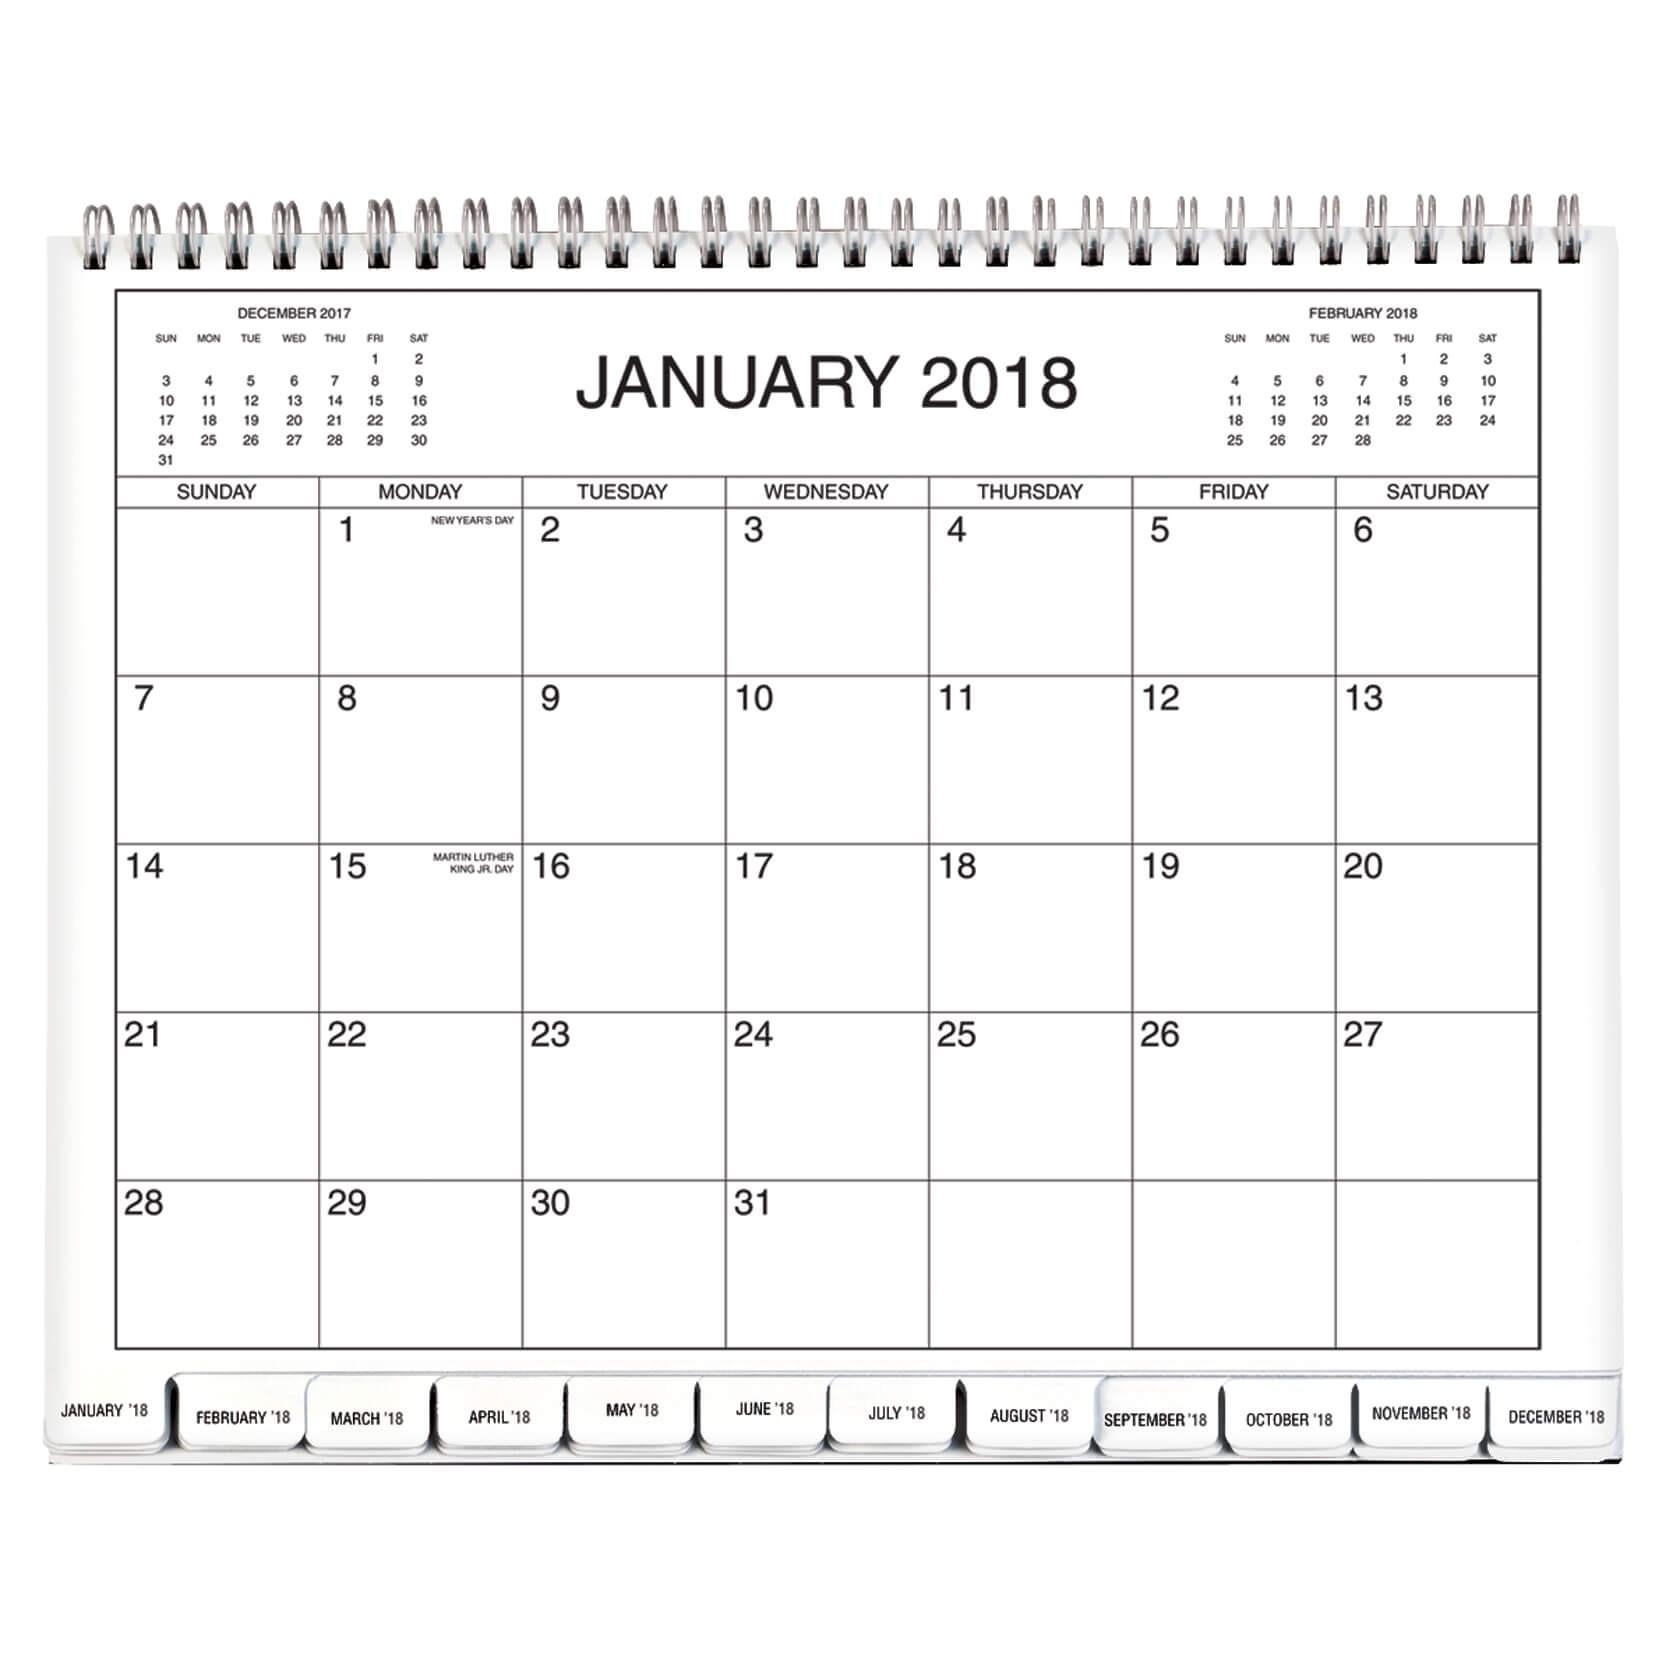 Monthly Bill Organizer – Bill Organizer With Pockets-Monthly Calender 2020 Organizer For Bills